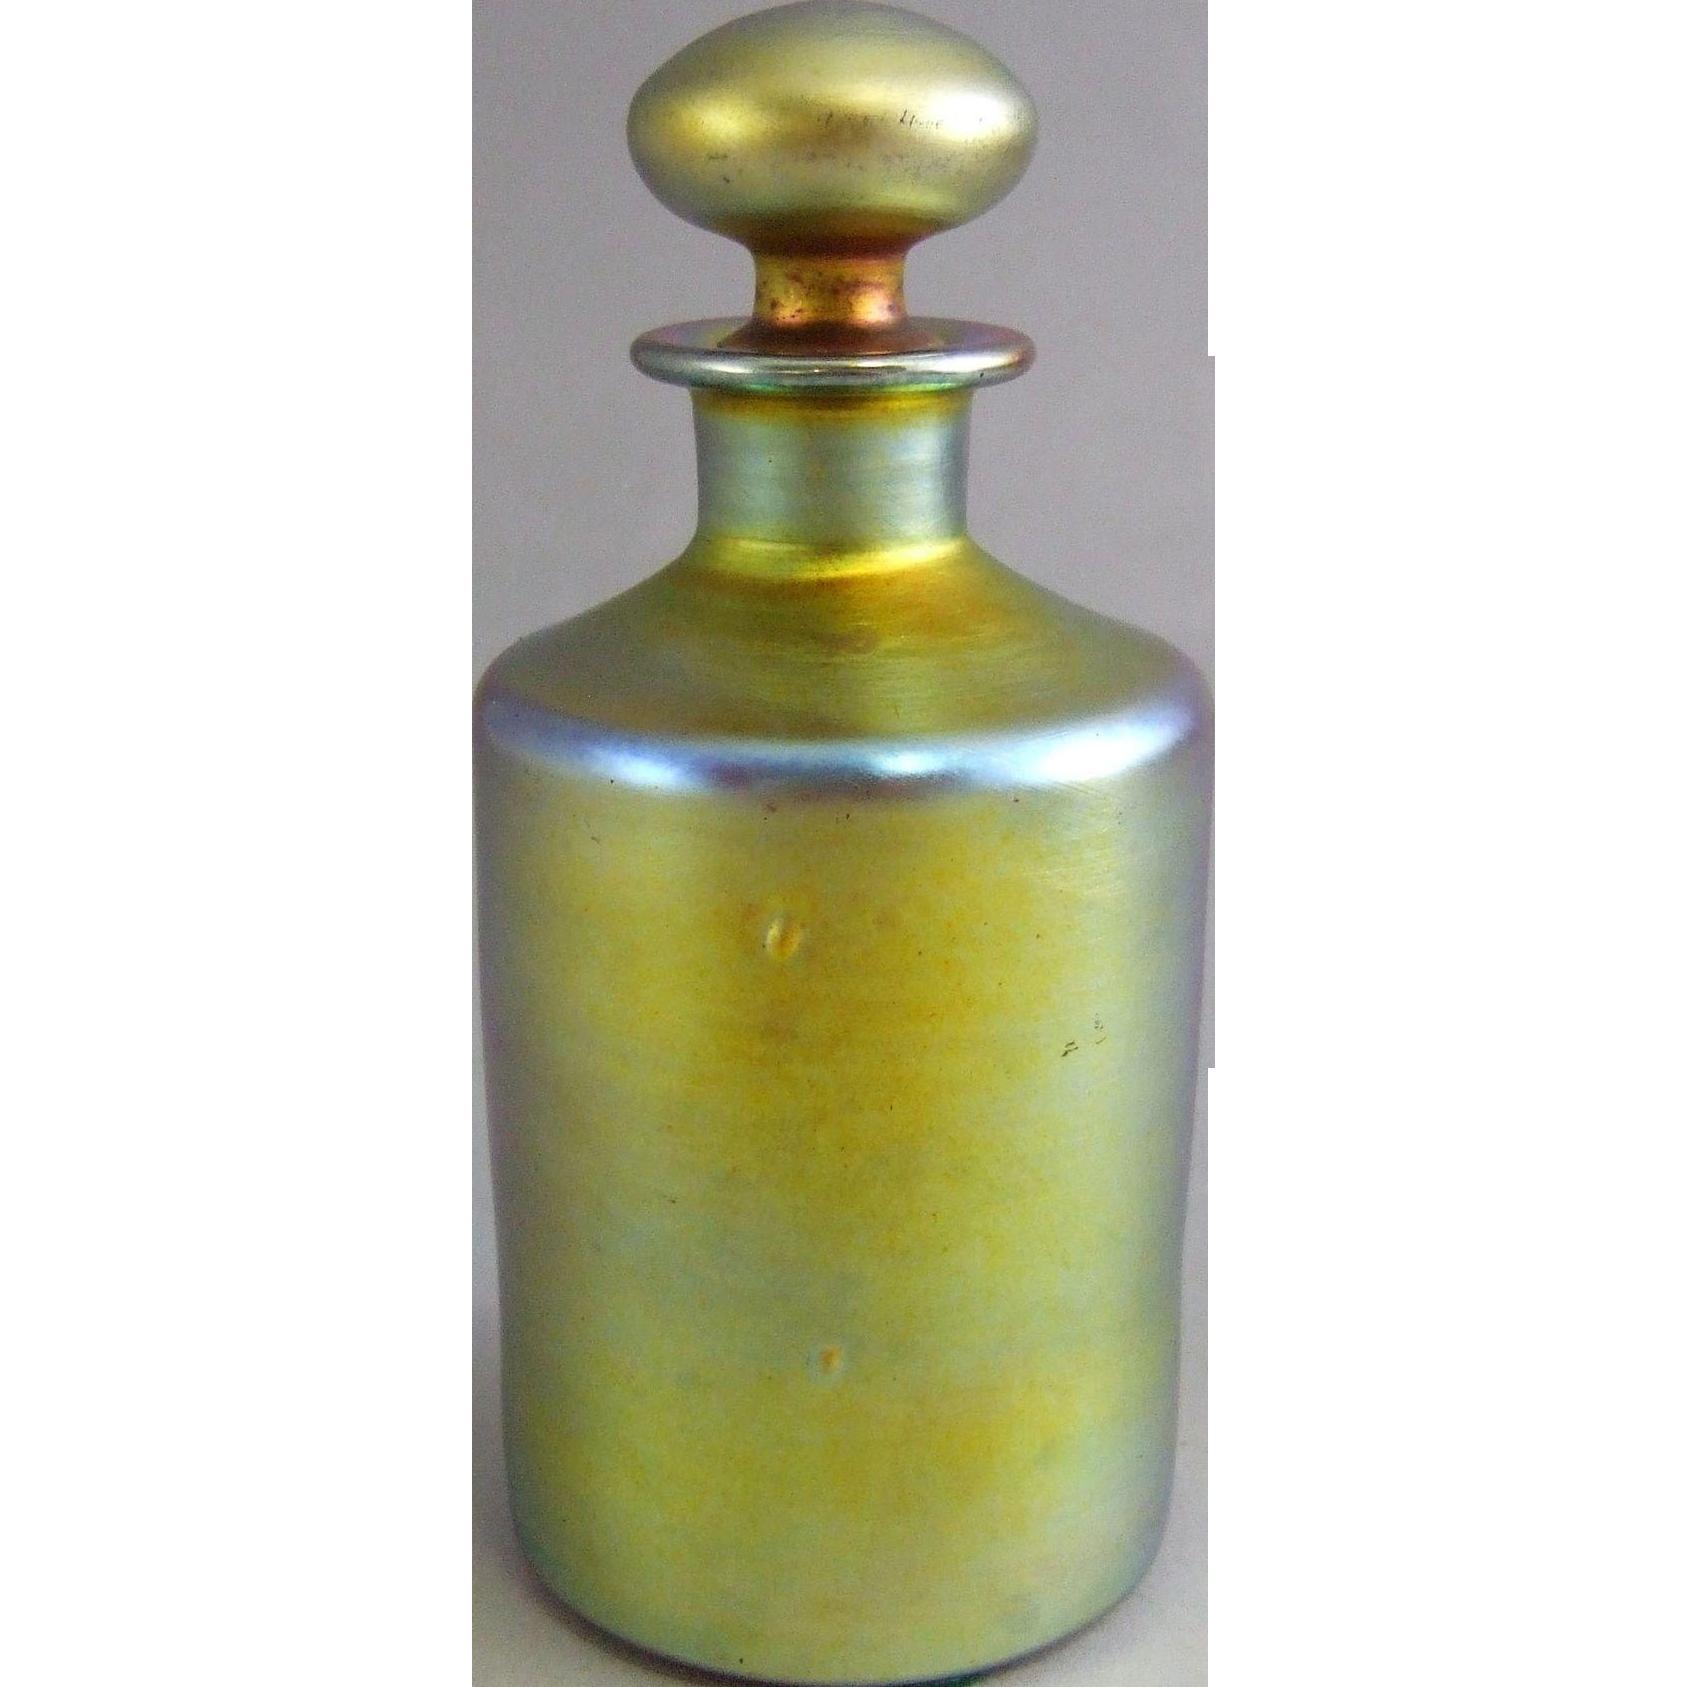 Steuben Glass Gold Aurene Cologne Perfume Bottle 1419